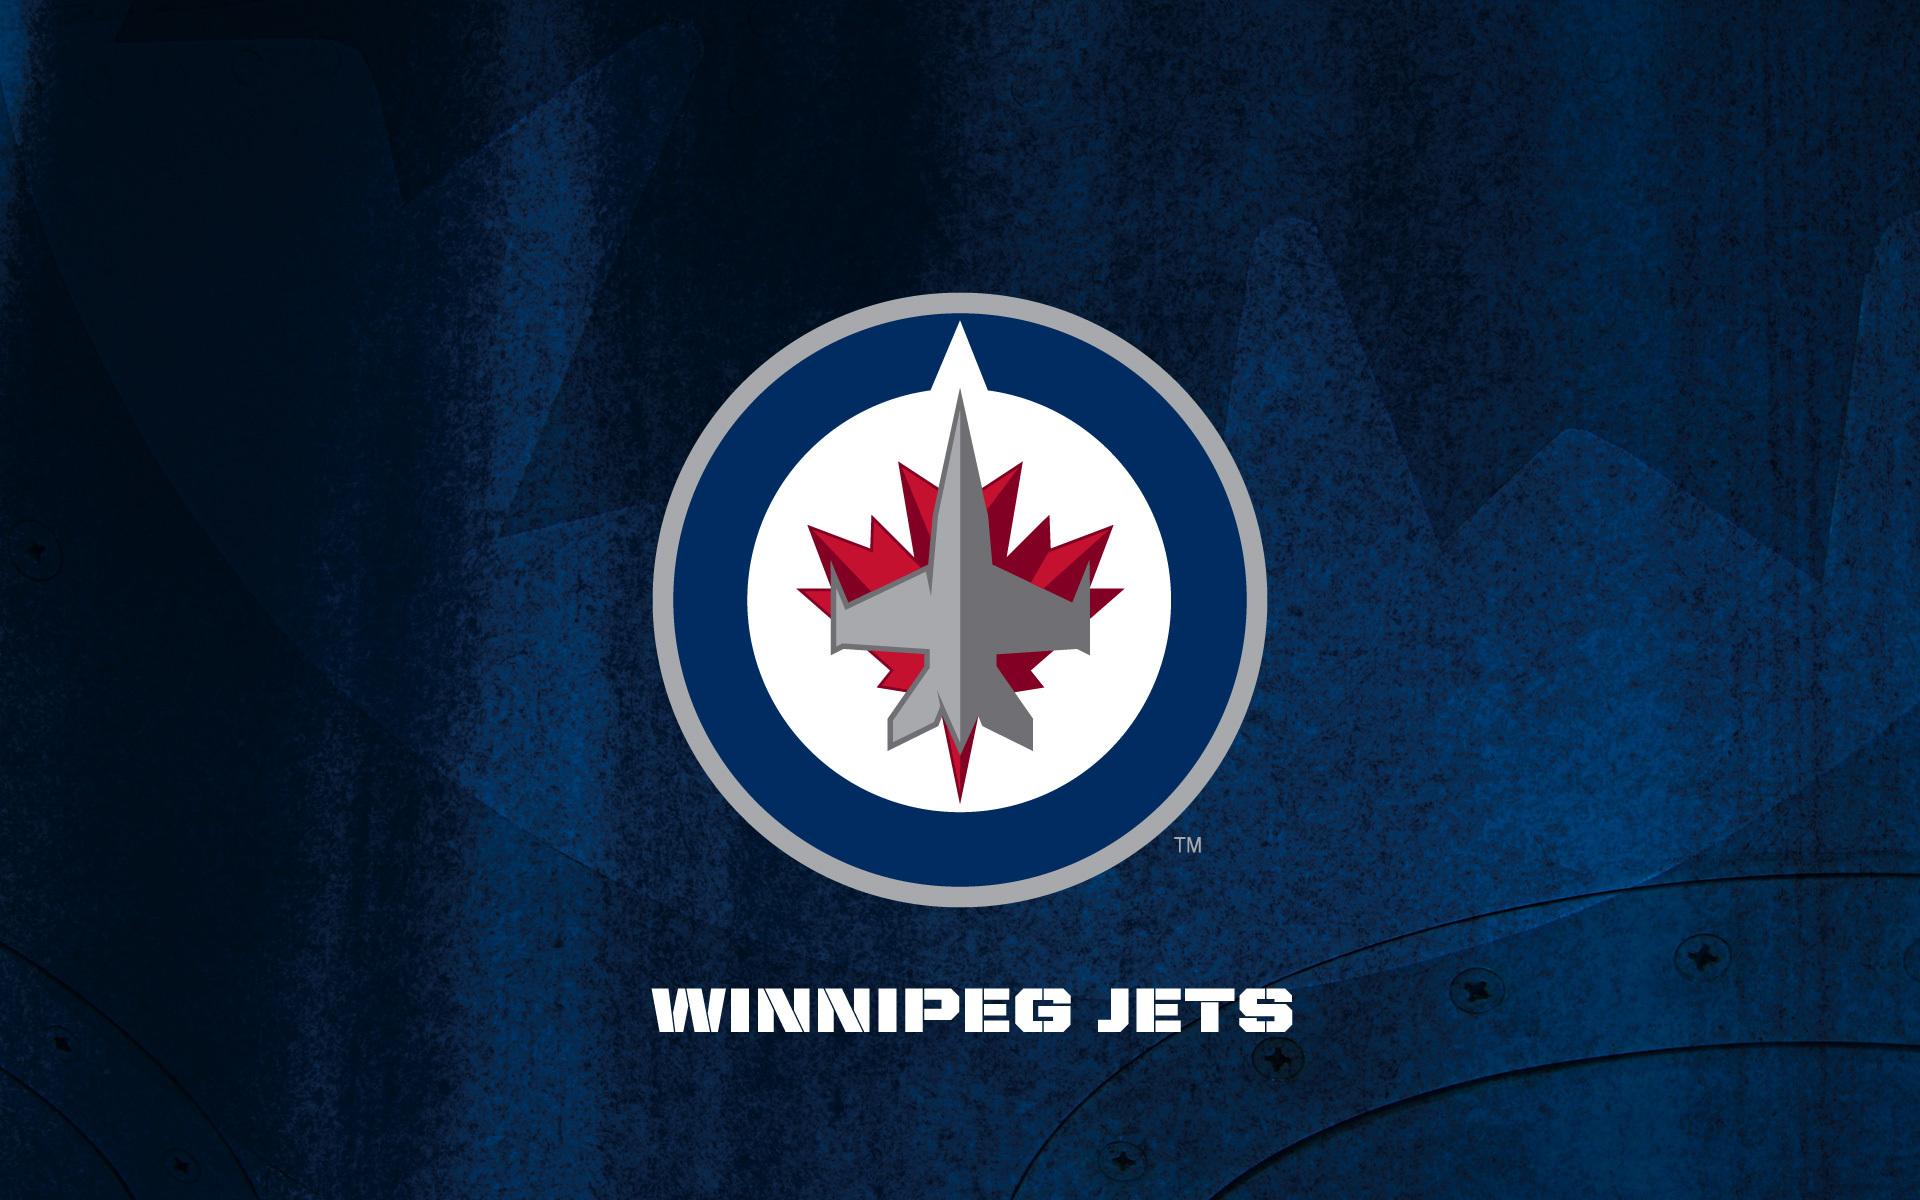 NHL Winnipeg Jets Logo Blue wallpaper 2018 in Hockey 1920x1200